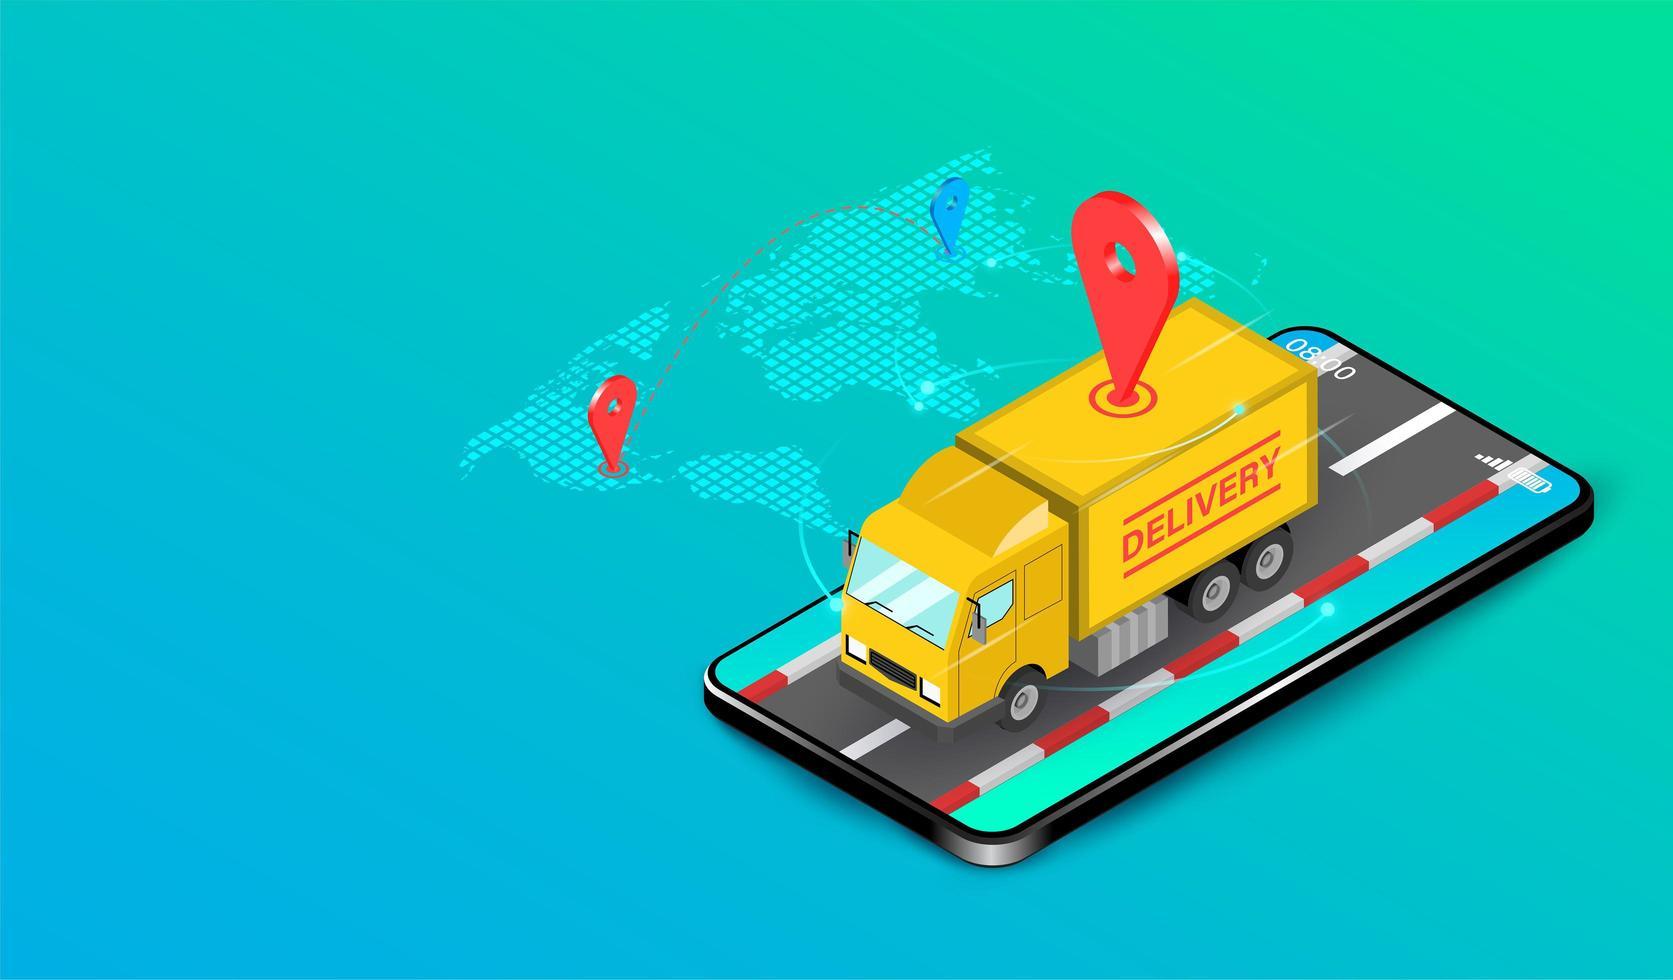 leverans express med lastbil med via e-handelssystem på smartphone vektor